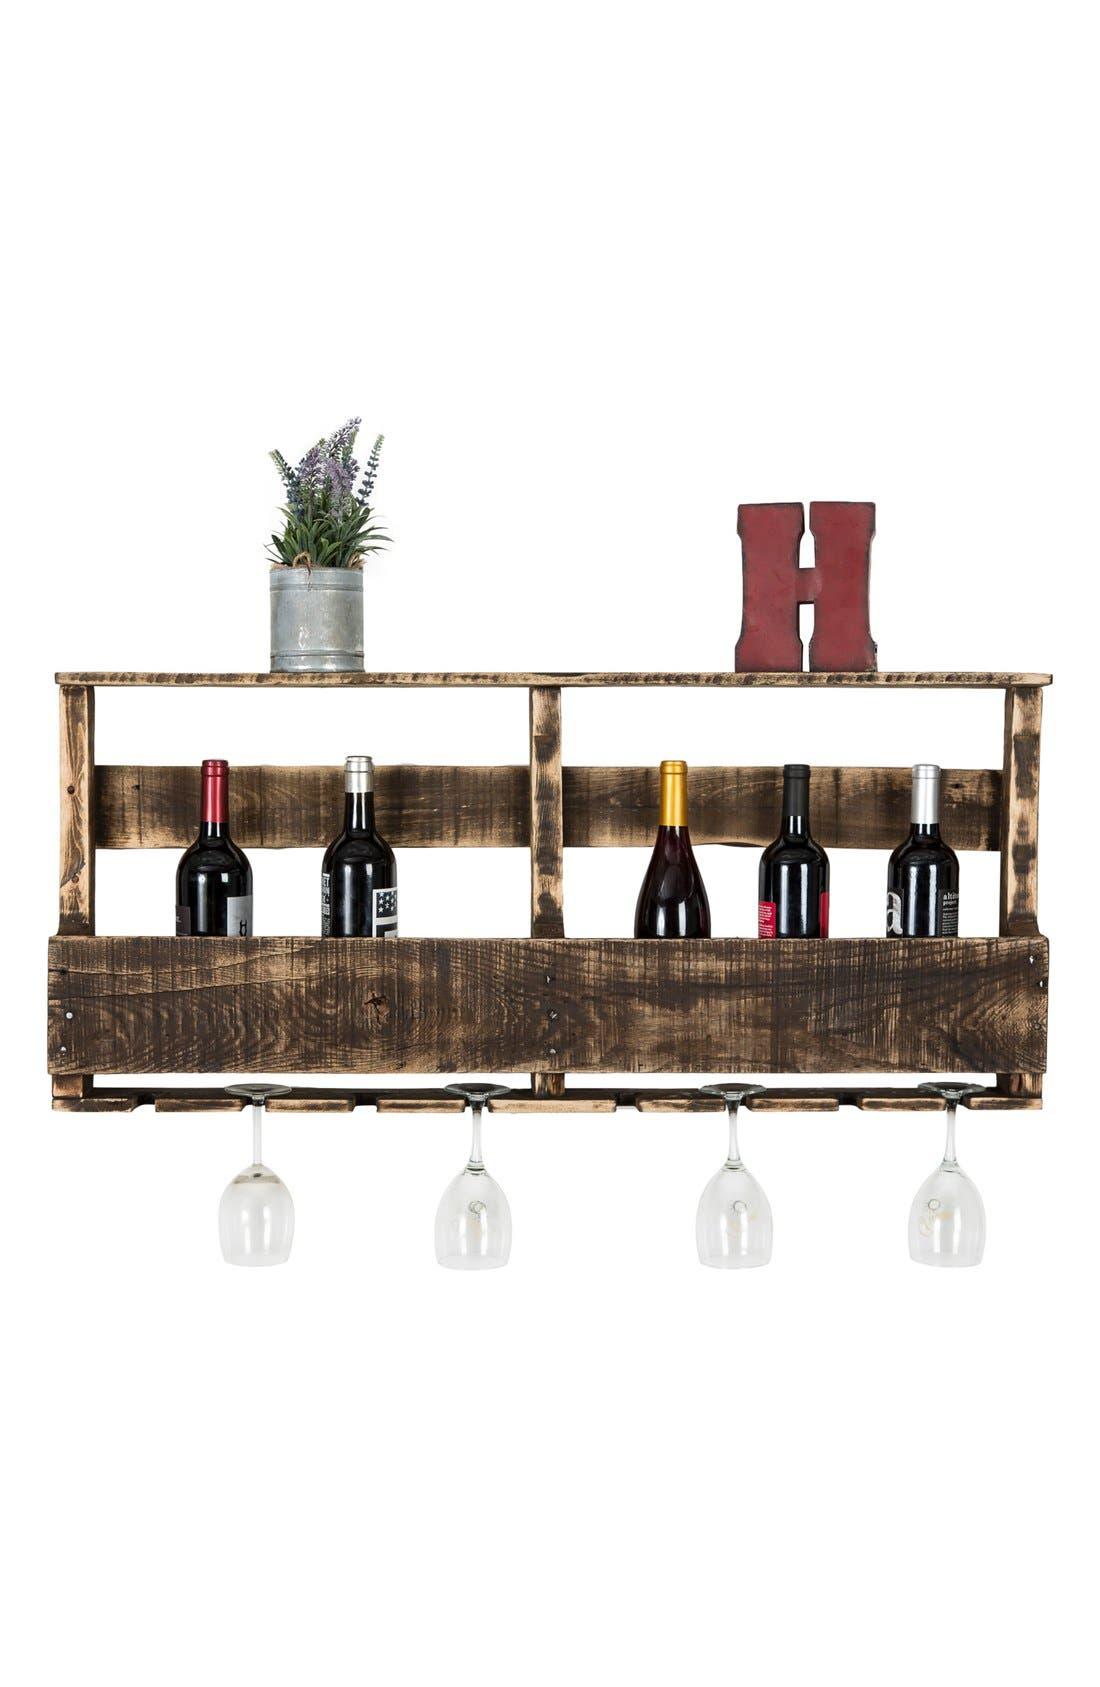 (del) Hutson Designs 'Top Shelf' RepurposedWood Wine Rack,                             Alternate thumbnail 2, color,                             Darkwalnut Distressed